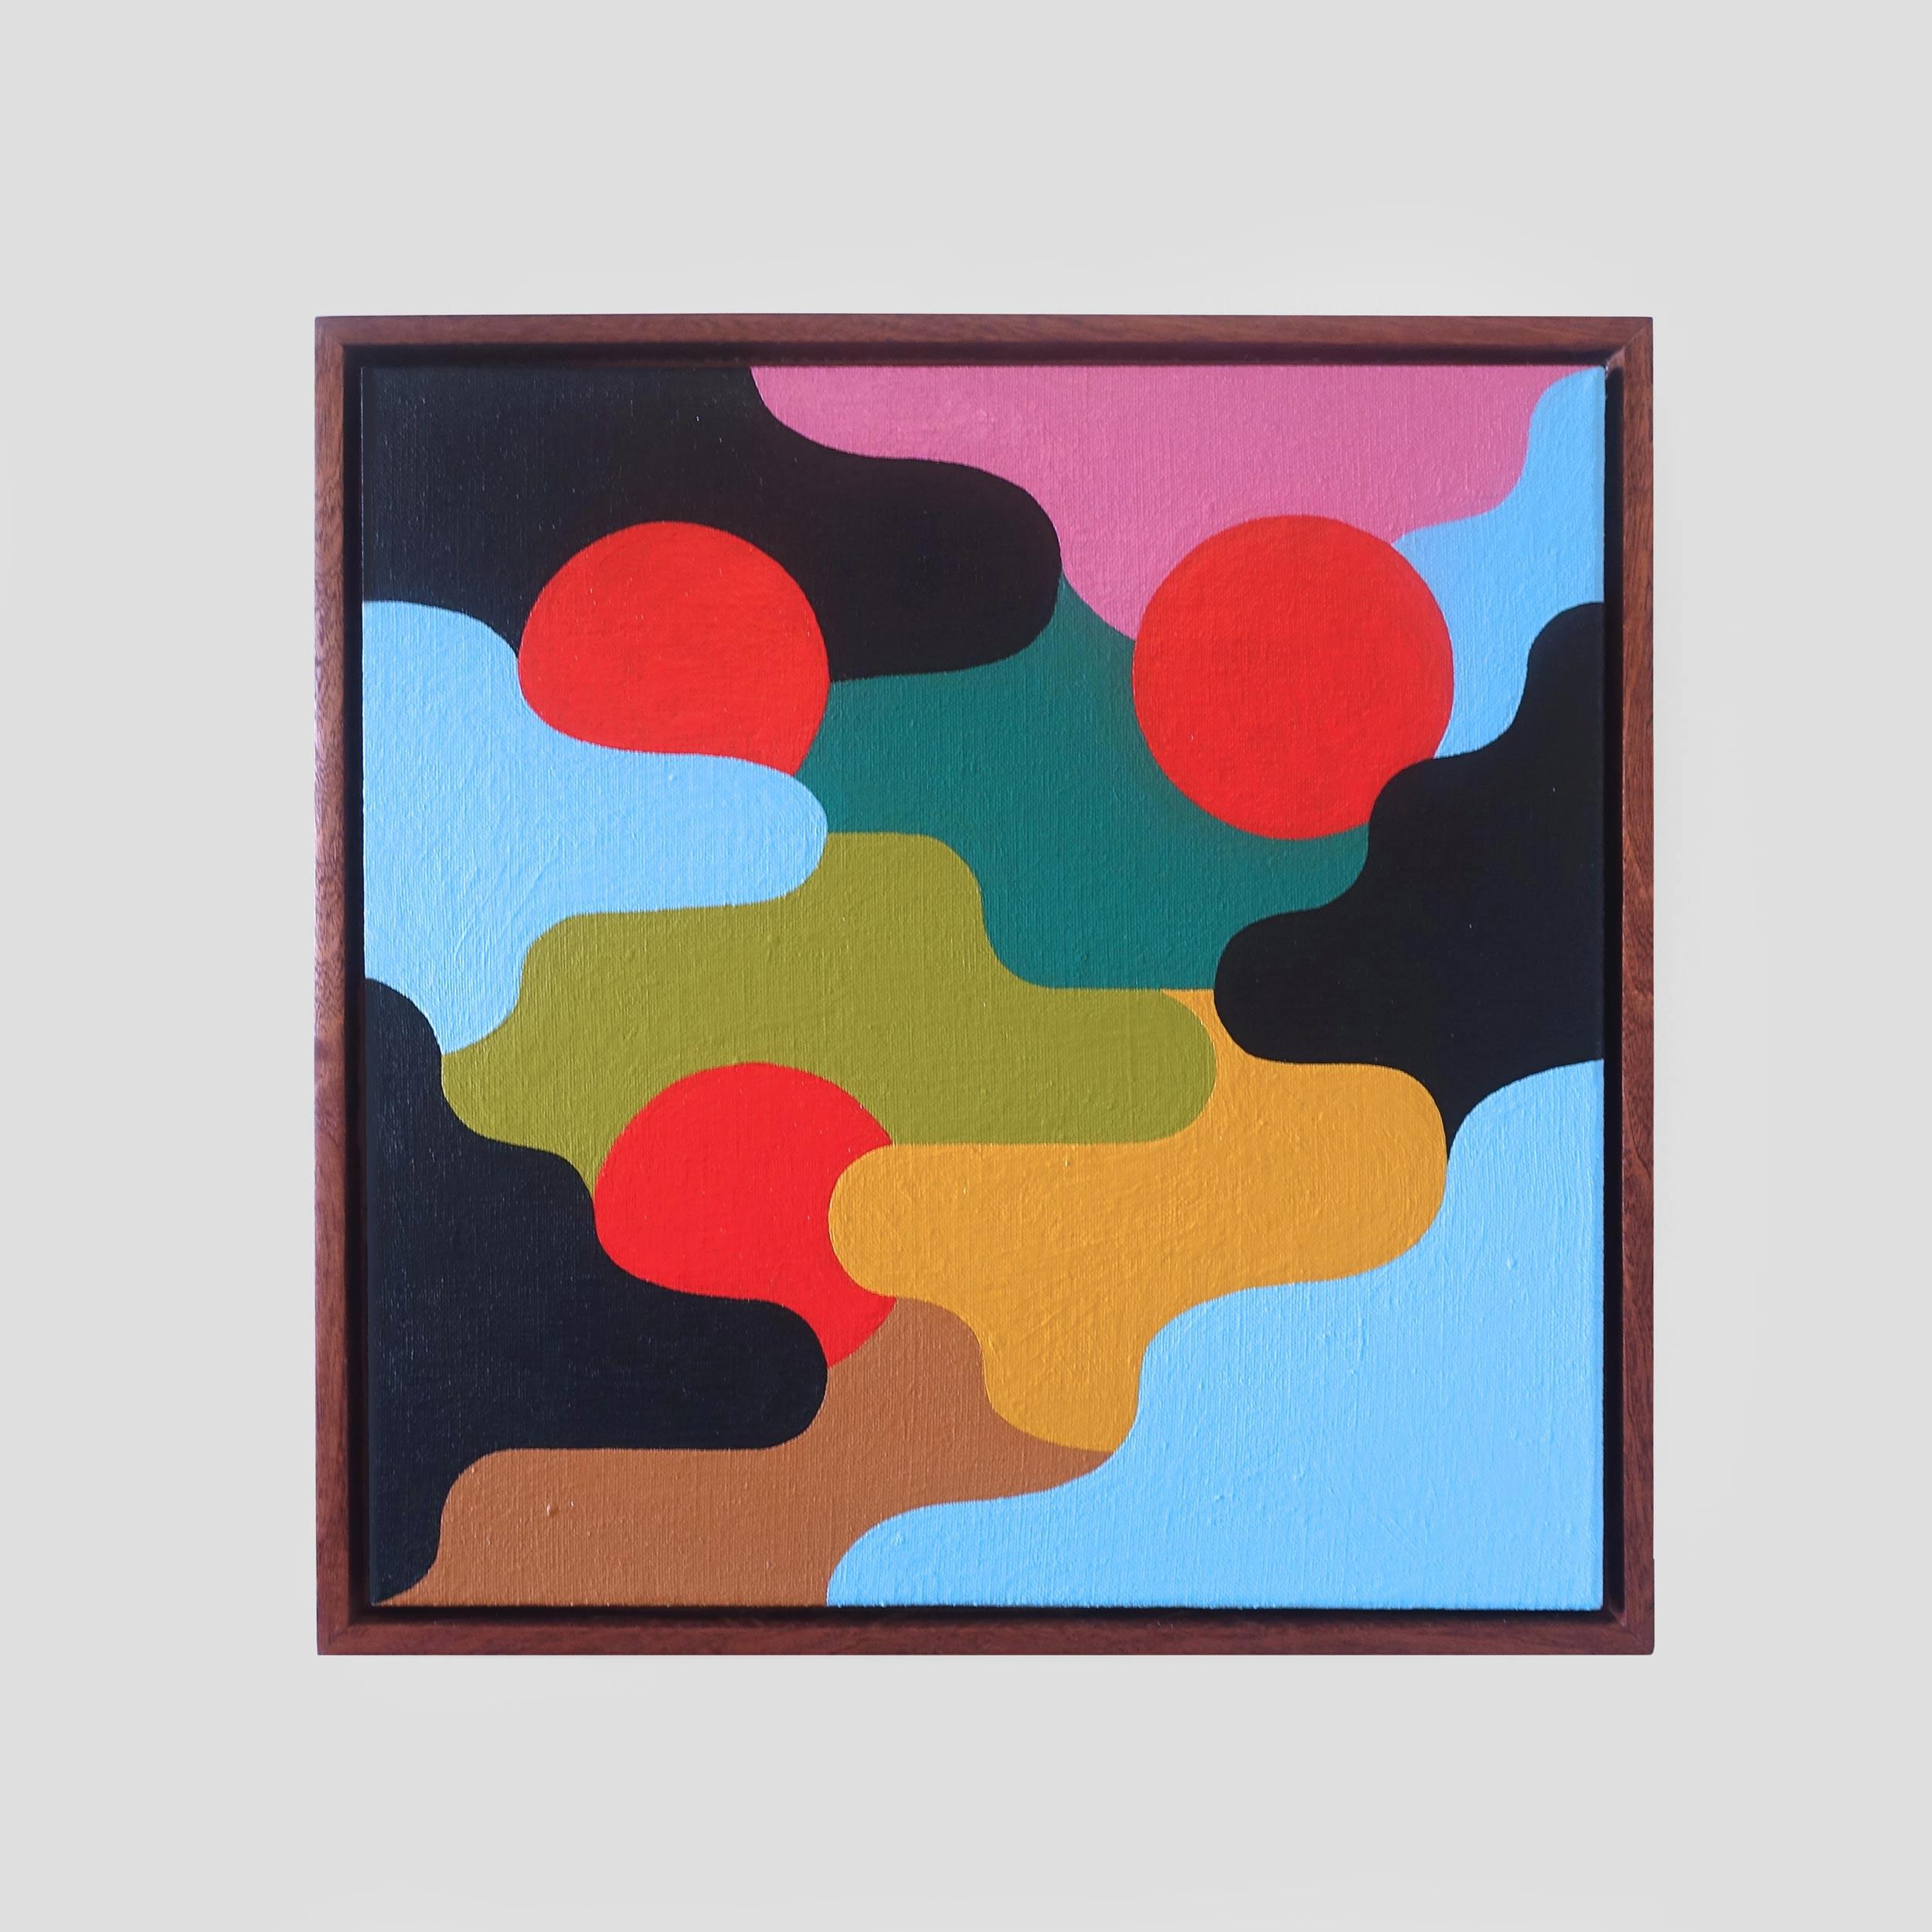 Square Composition No. 8  41 x 41 cm | acrylic on linen, sapele frame | 2018